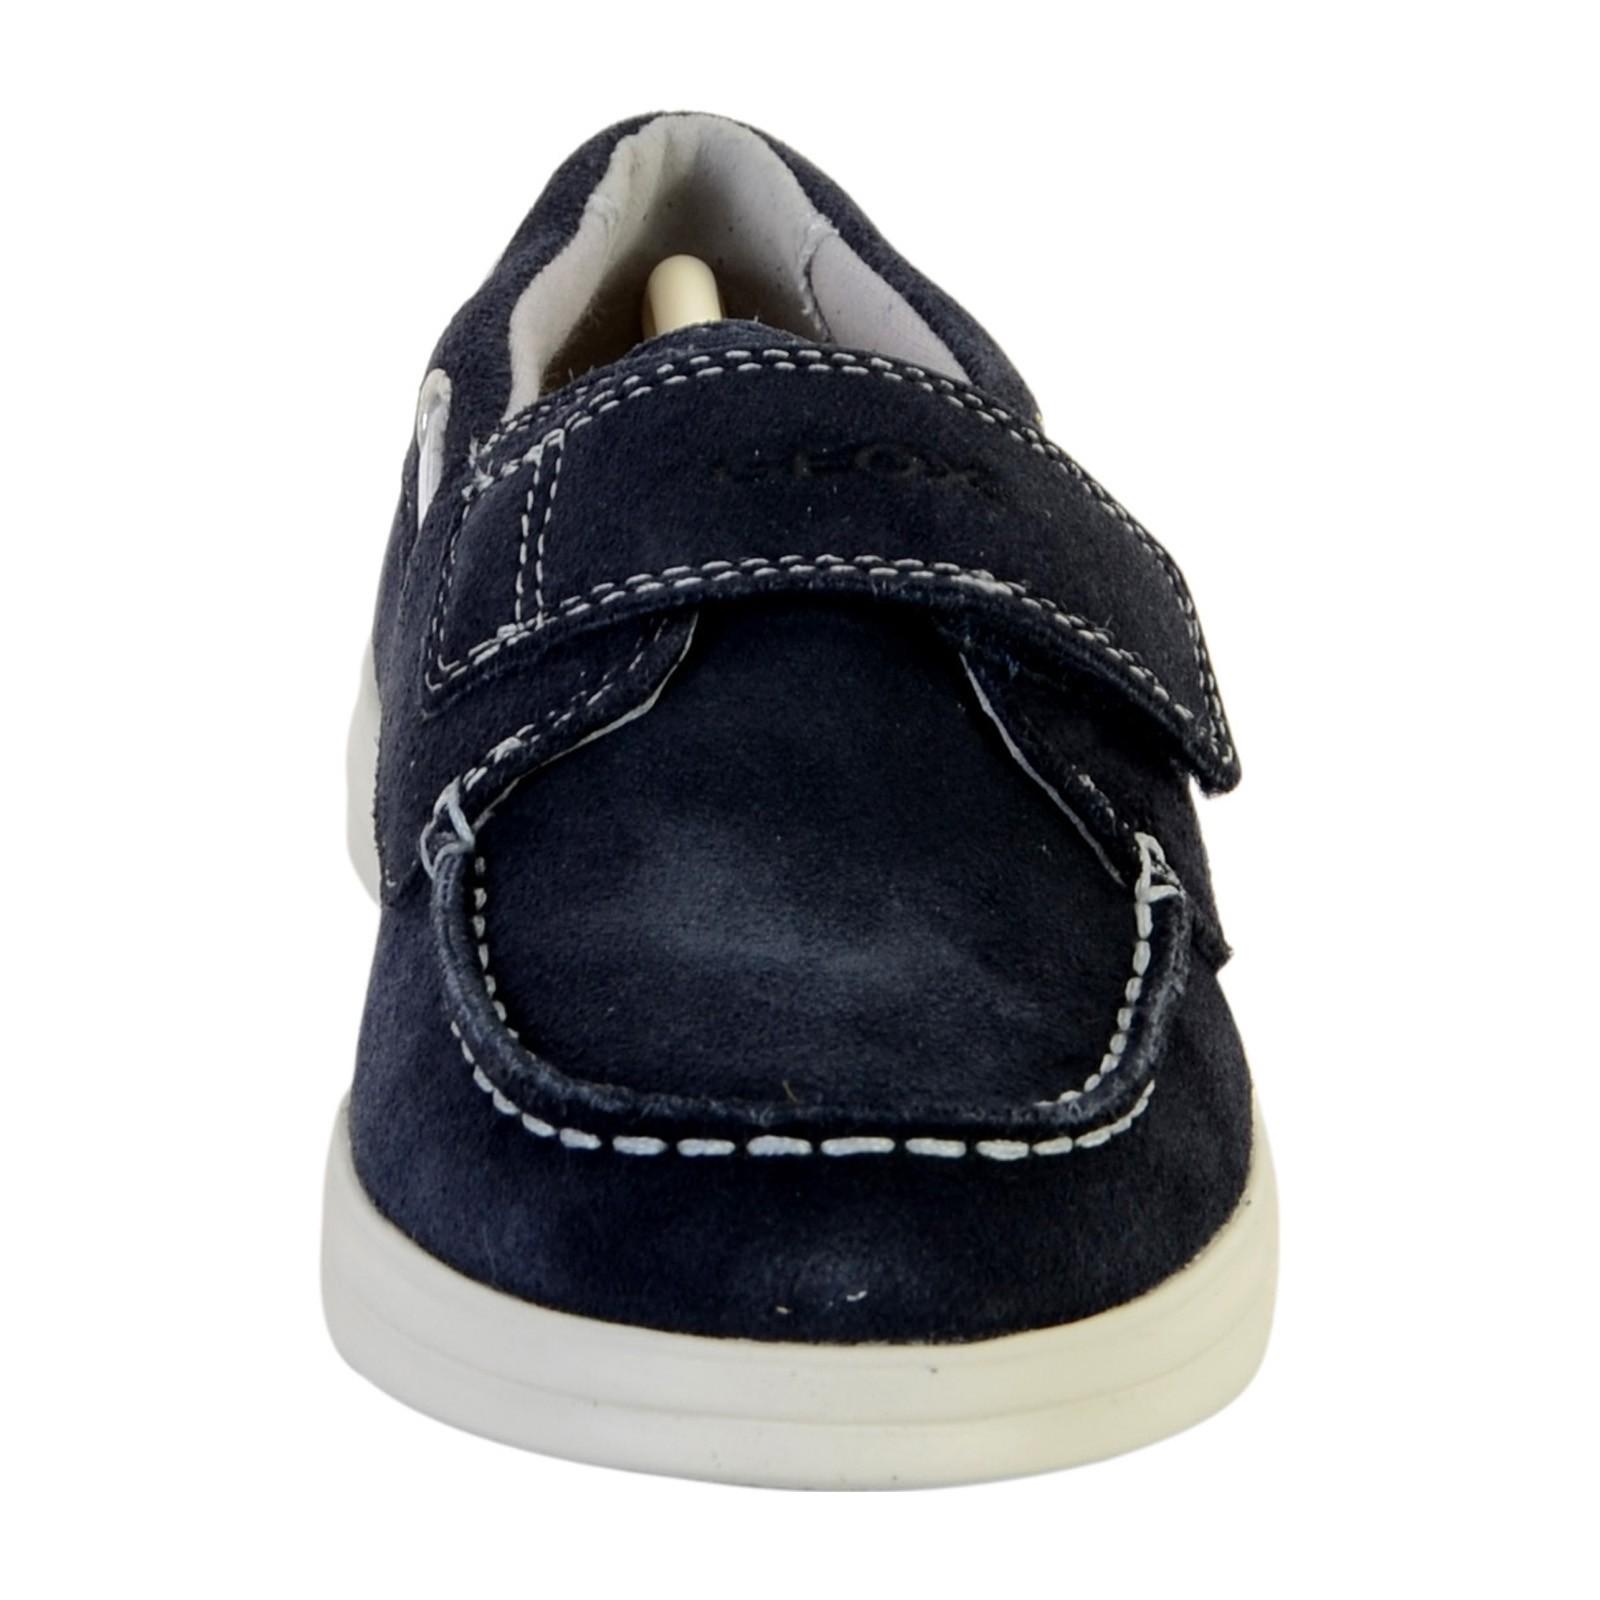 Chaussure-Geox-Enfant-J-Anthor miniature 3